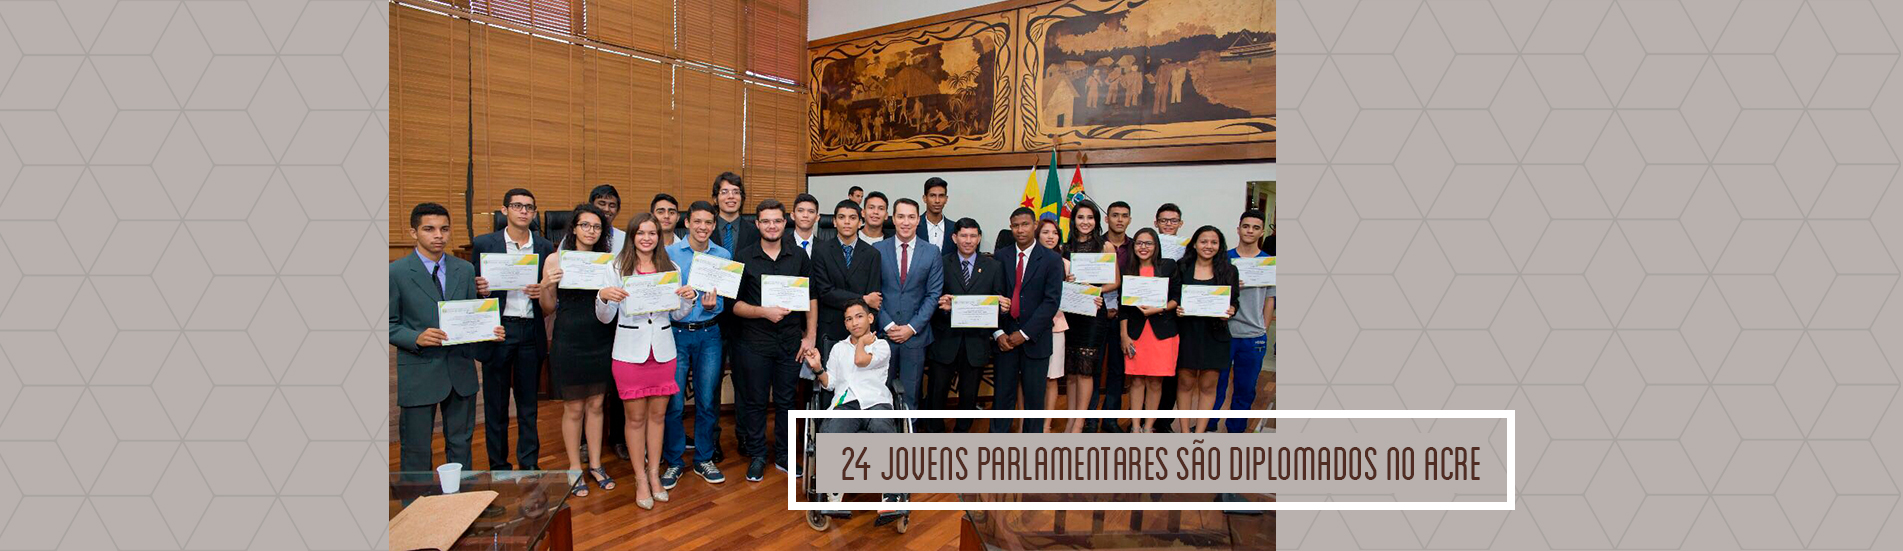 banner-site-abel-jovens-diplomados